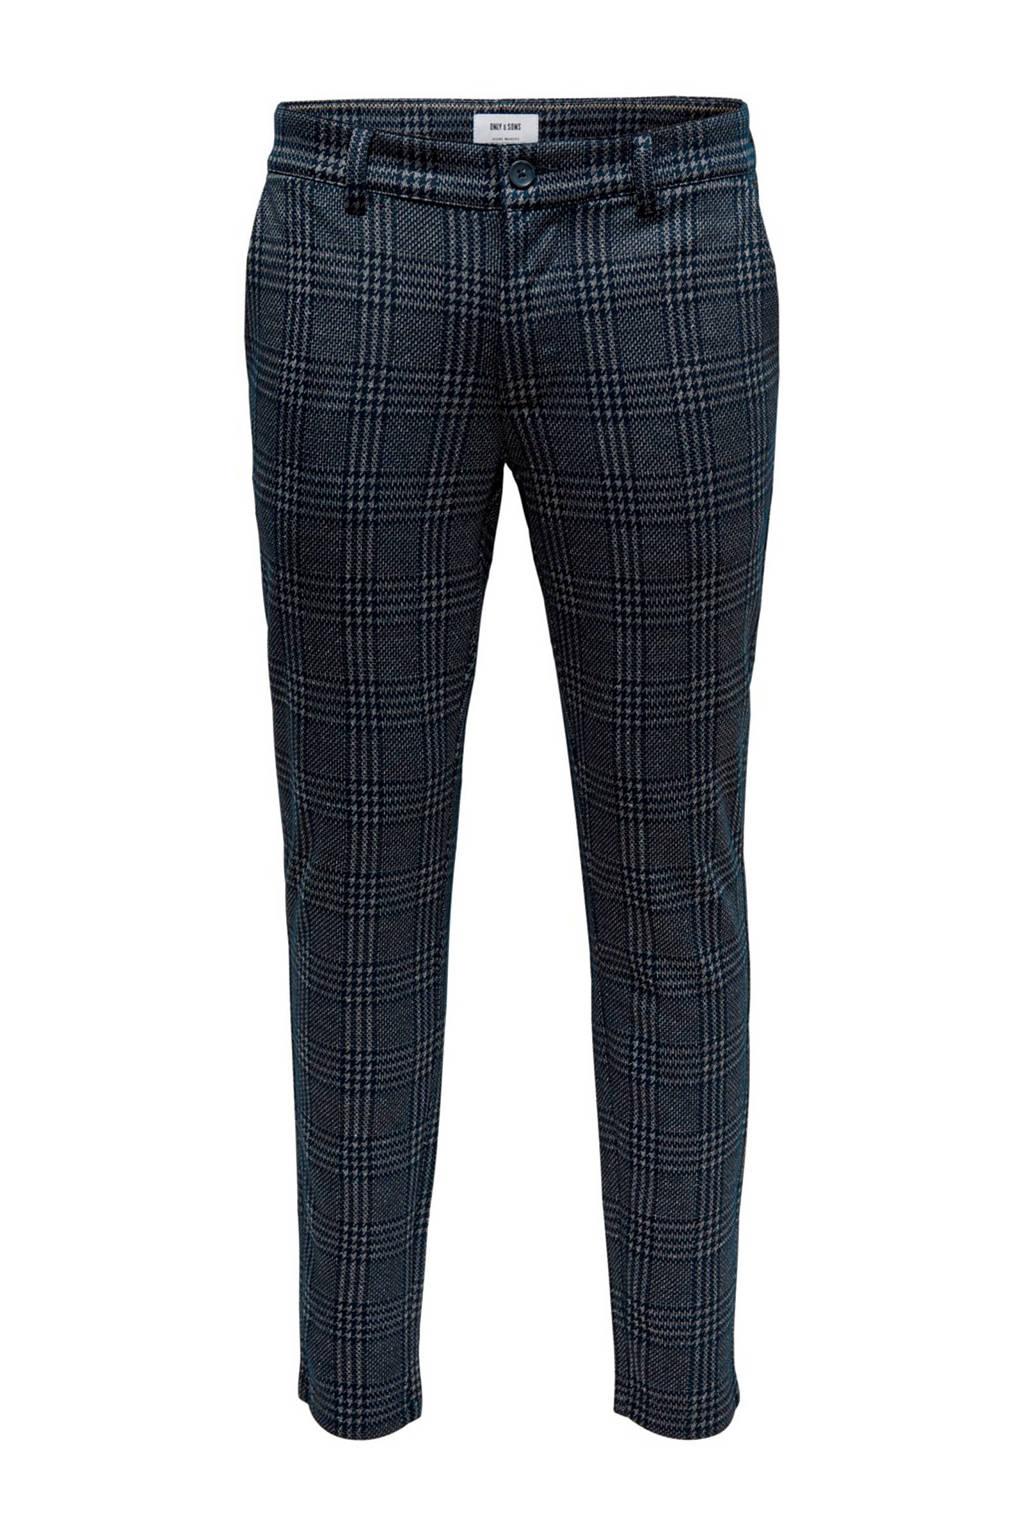 ONLY & SONS geruite slim fit pantalon donkerblauw, Donkerblauw